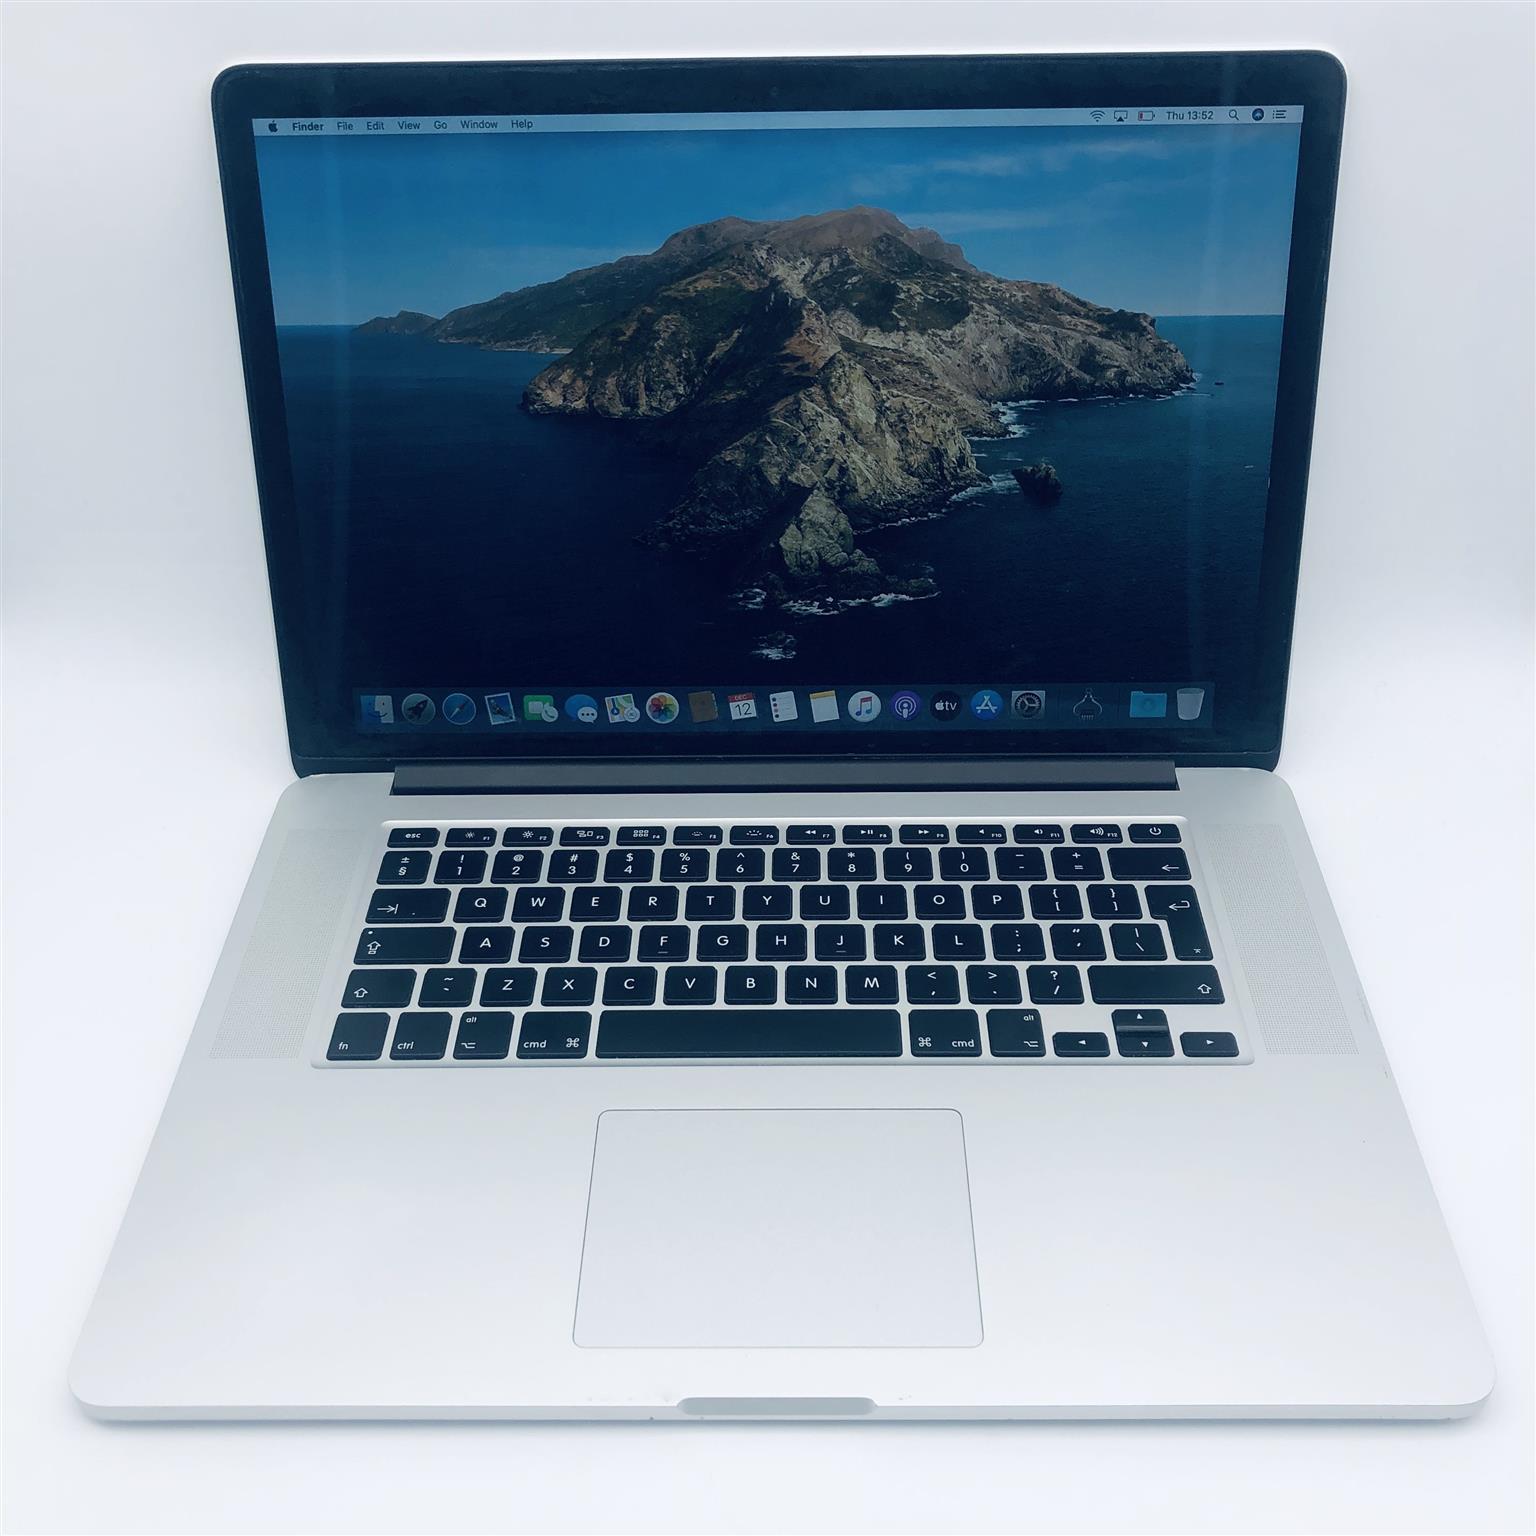 Apple MacBook Pro 15-inch 2.0GHz Quad-Core i7 (Retina, 256GB, Silver) - Pre Owned